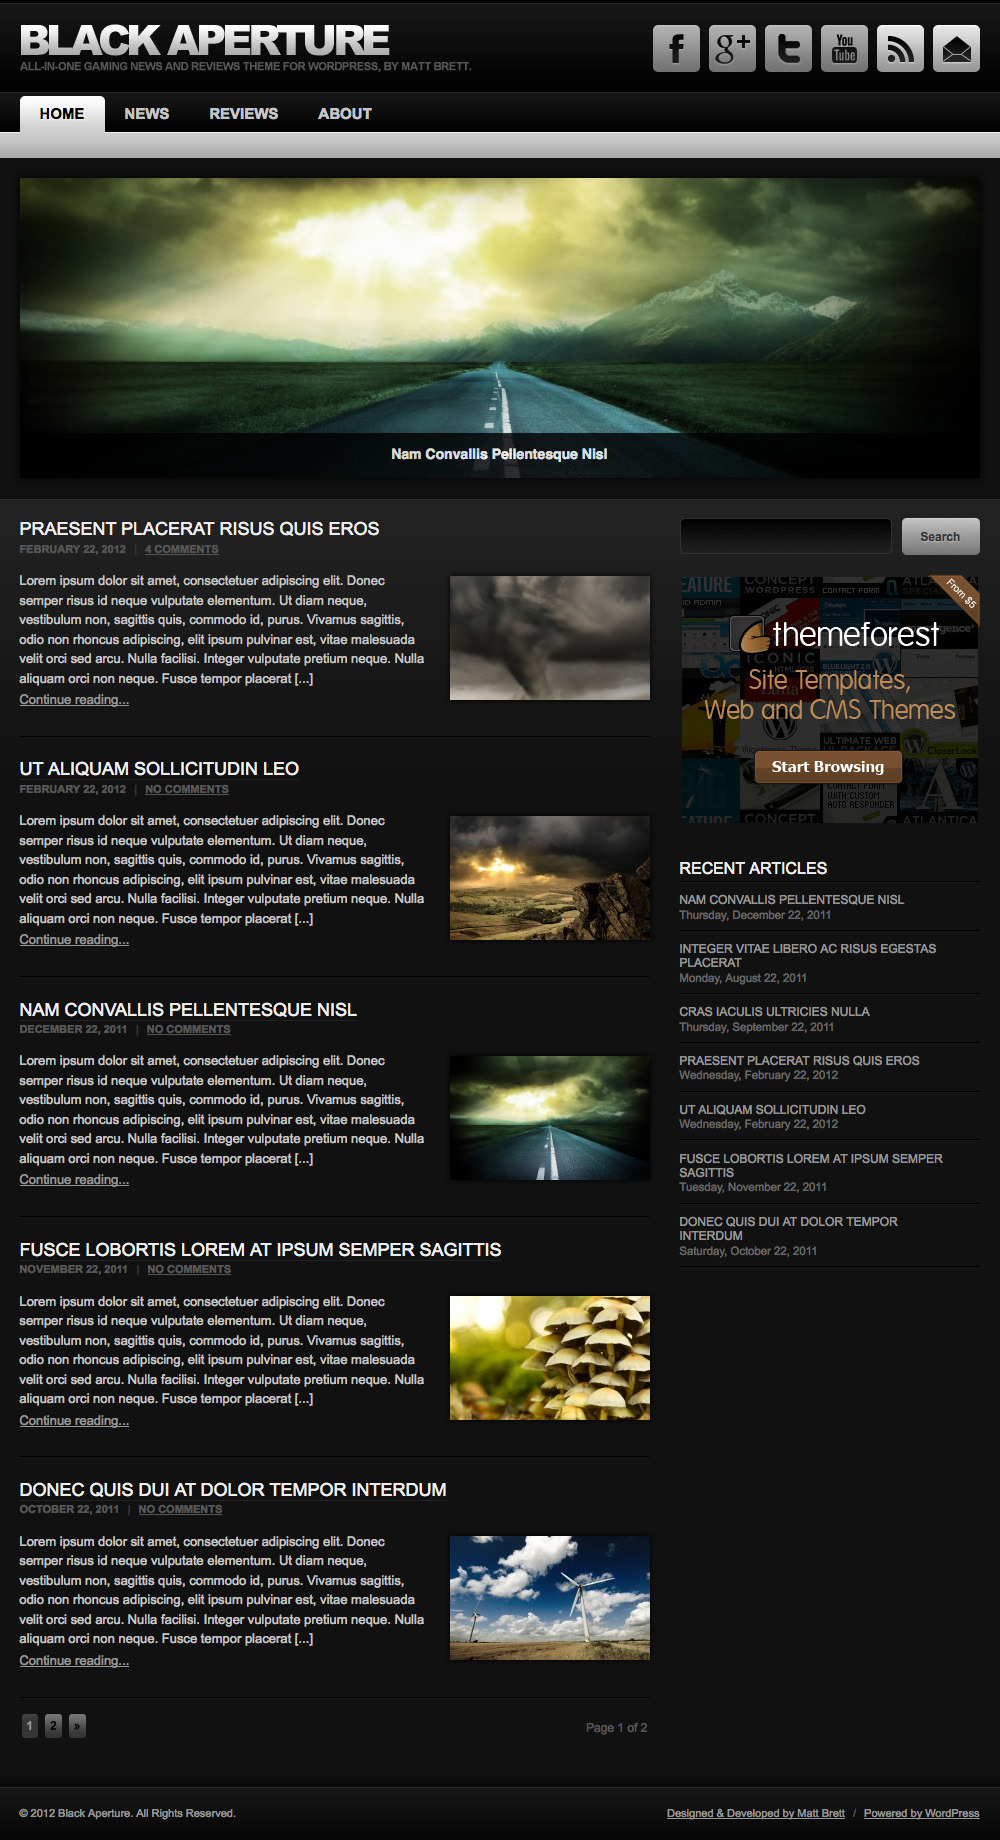 http://1.s3.envato.com/files/29719607/blackaperture_screenshots/02_homepage.jpg